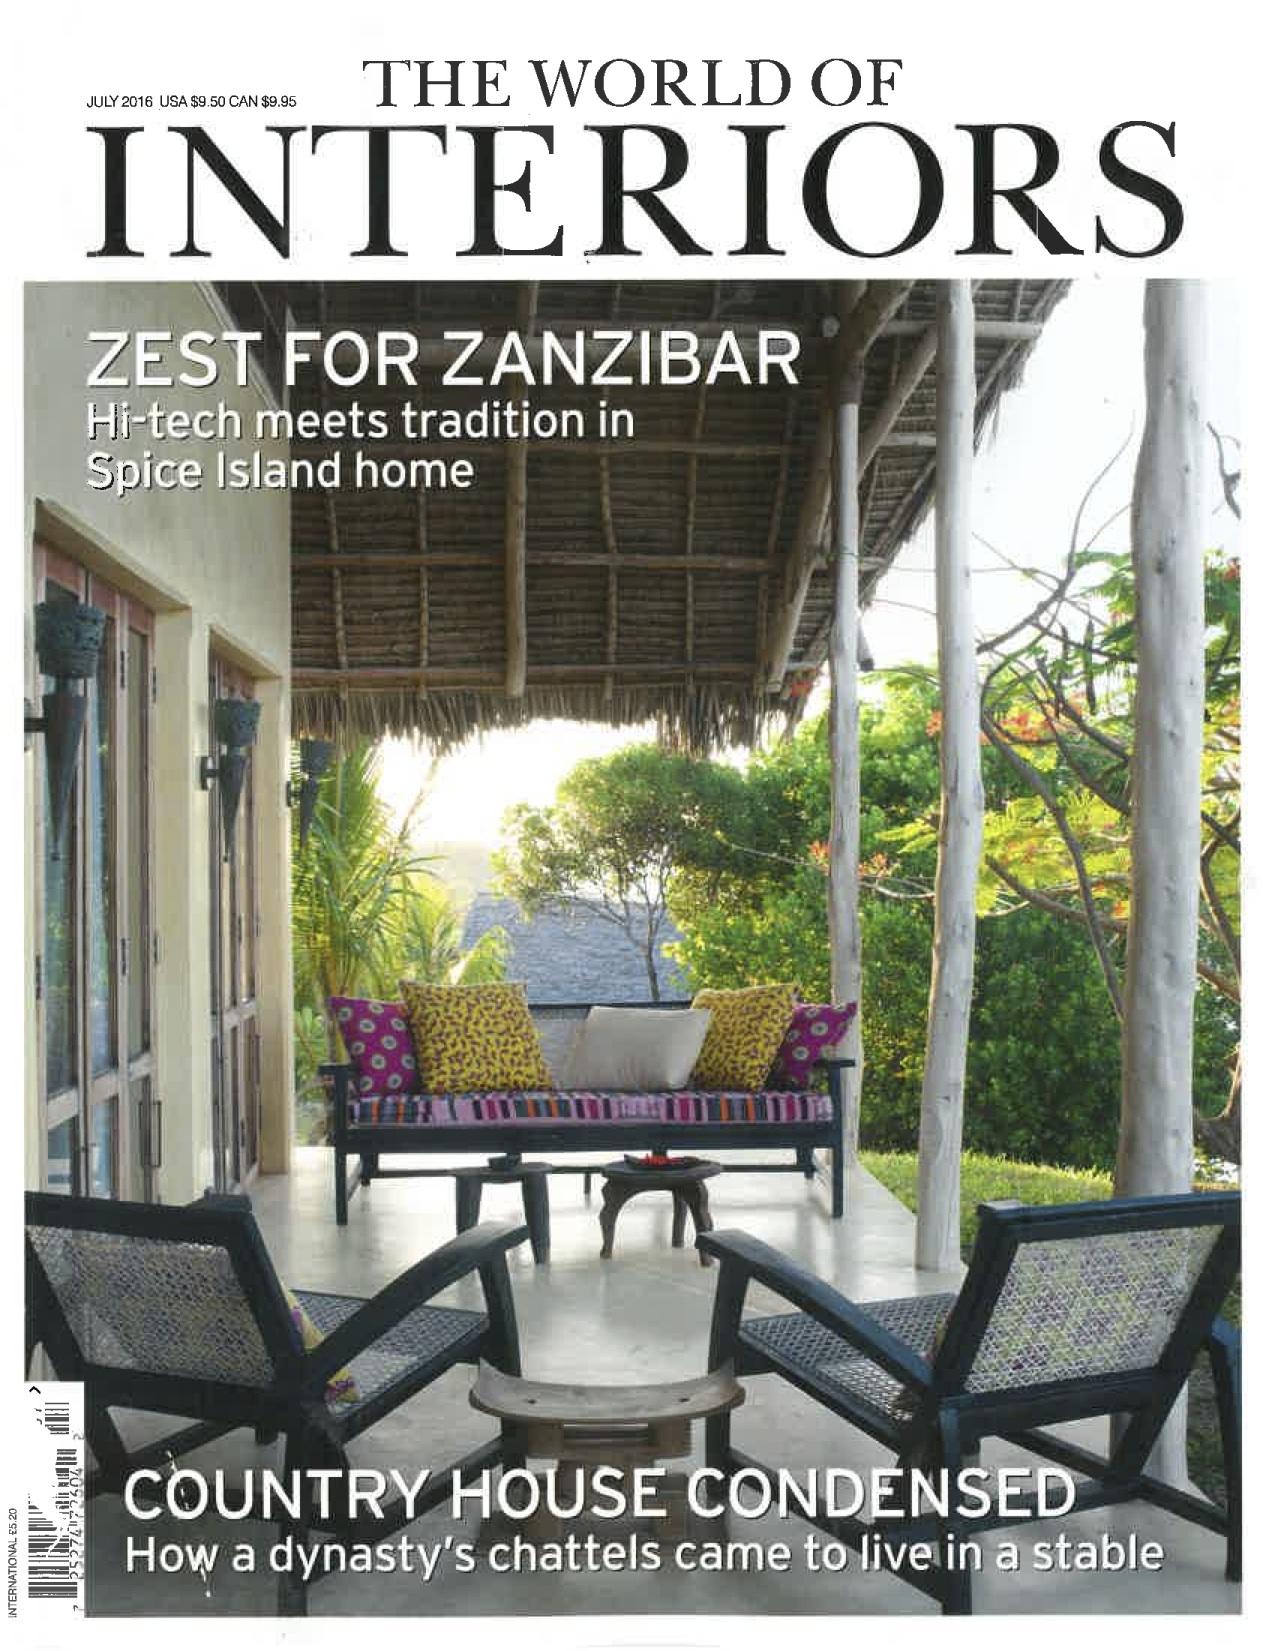 World of Interiors July16' Cover.jpg